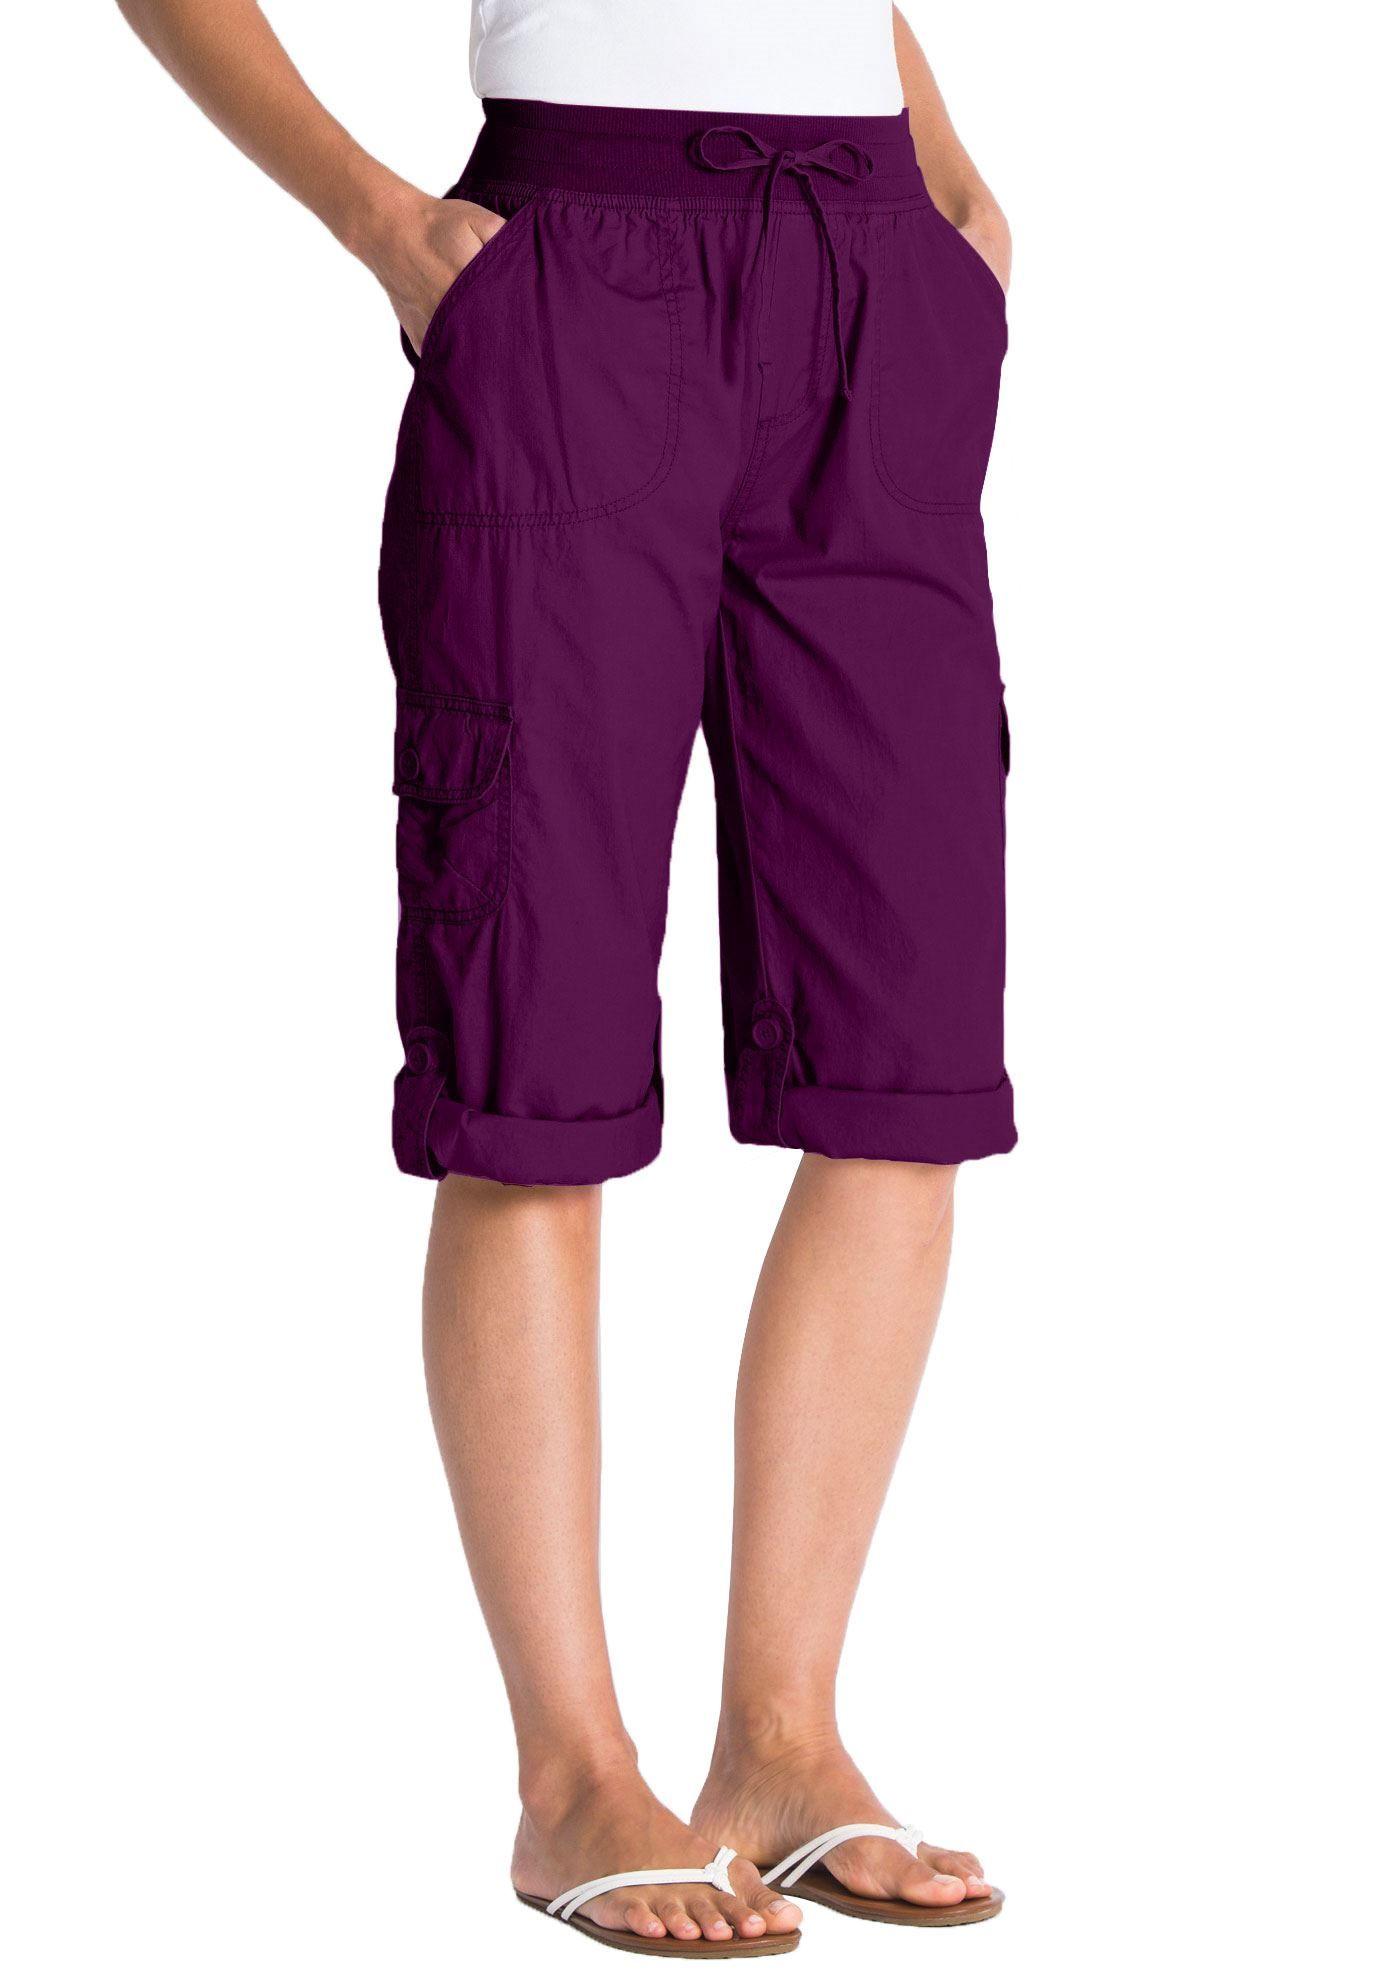 petite capri pants in convertible lengths - women's plus size